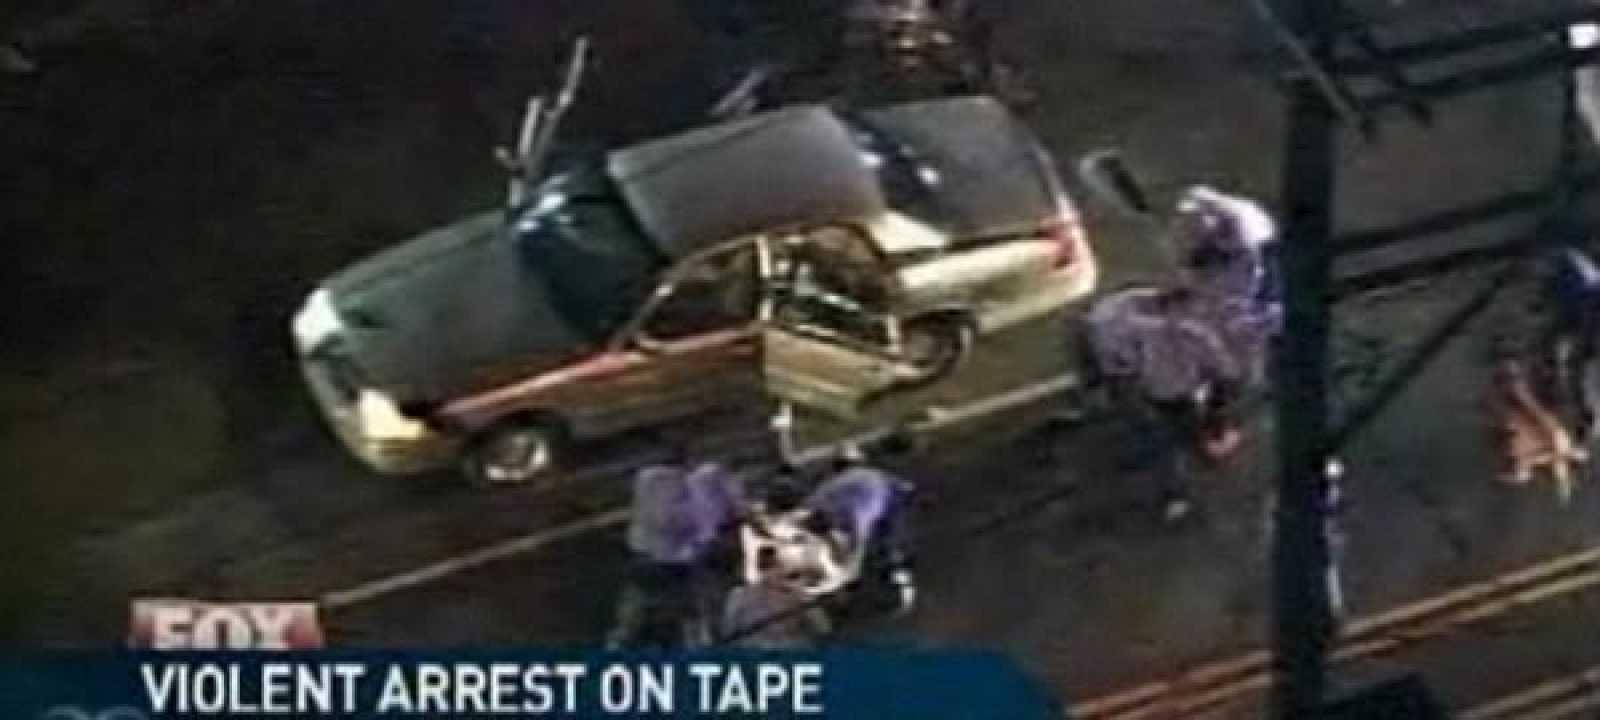 15 policías golpean a tres detenidos en Pensilvania, Estados Unidos.